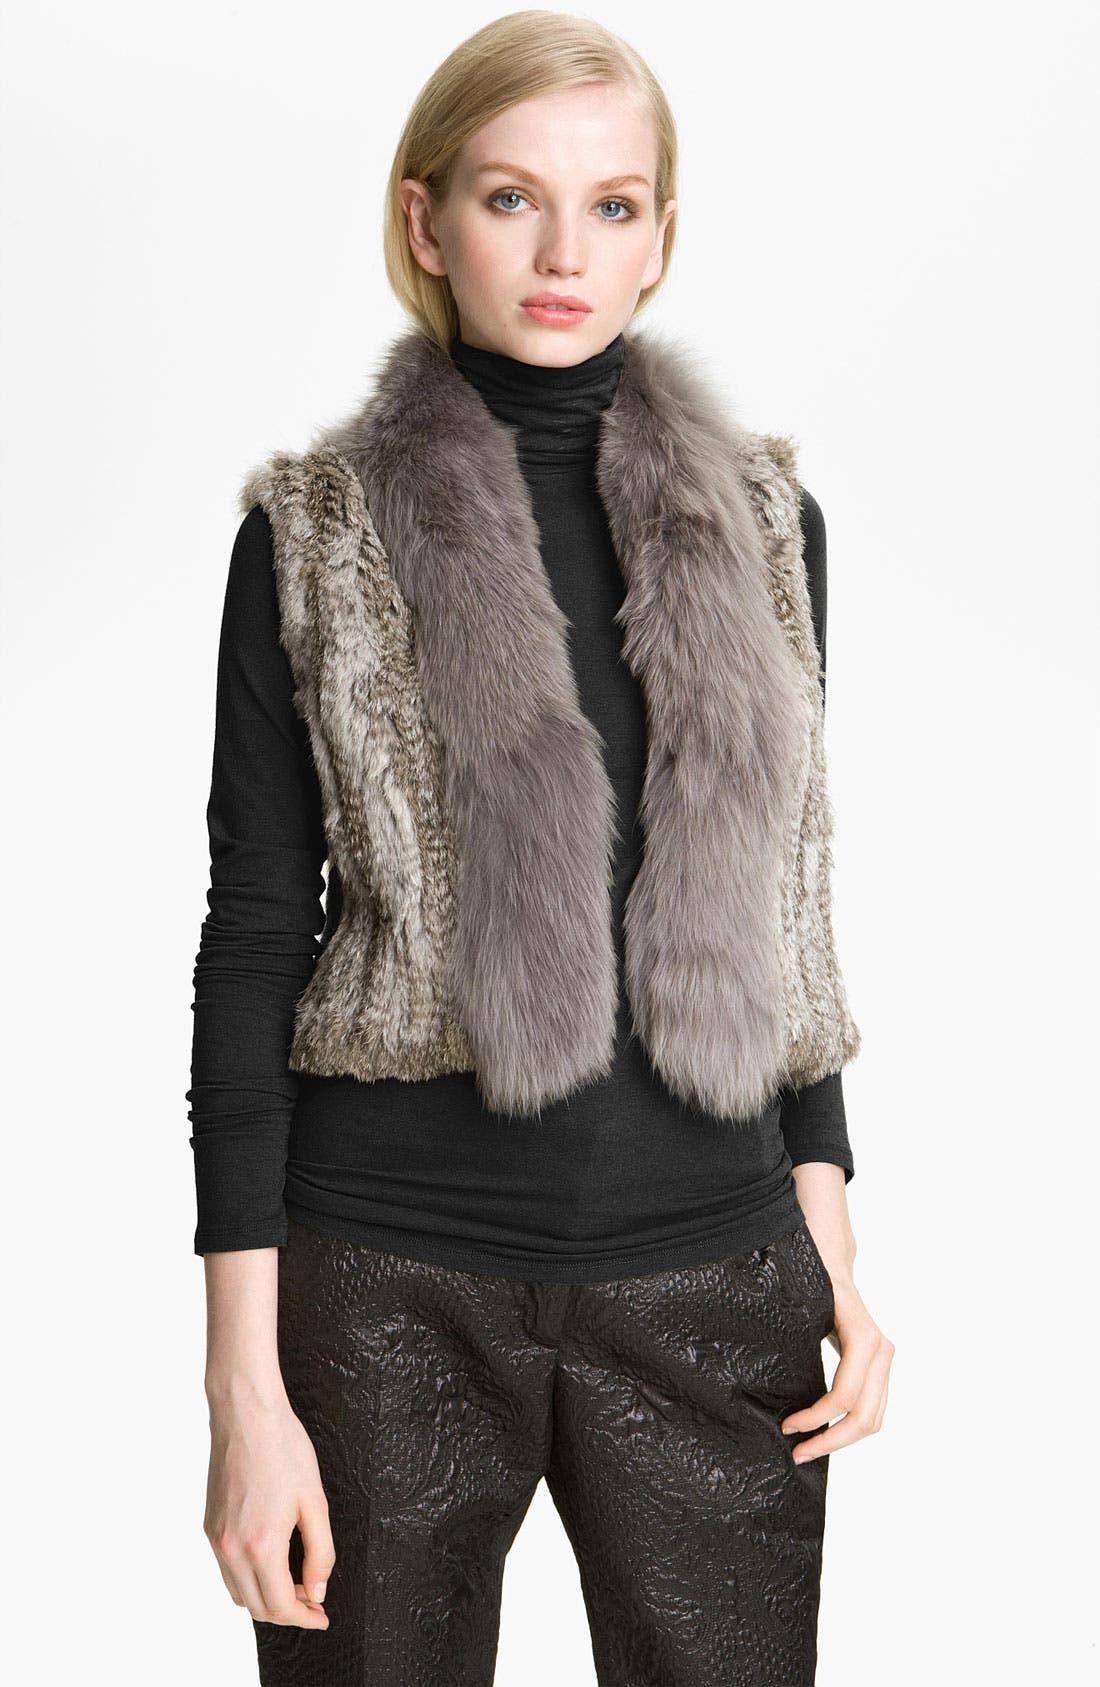 Alternate Image 1 Selected - Elizabeth and James 'Sean' Genuine Rabbit & Coyote Fur Vest